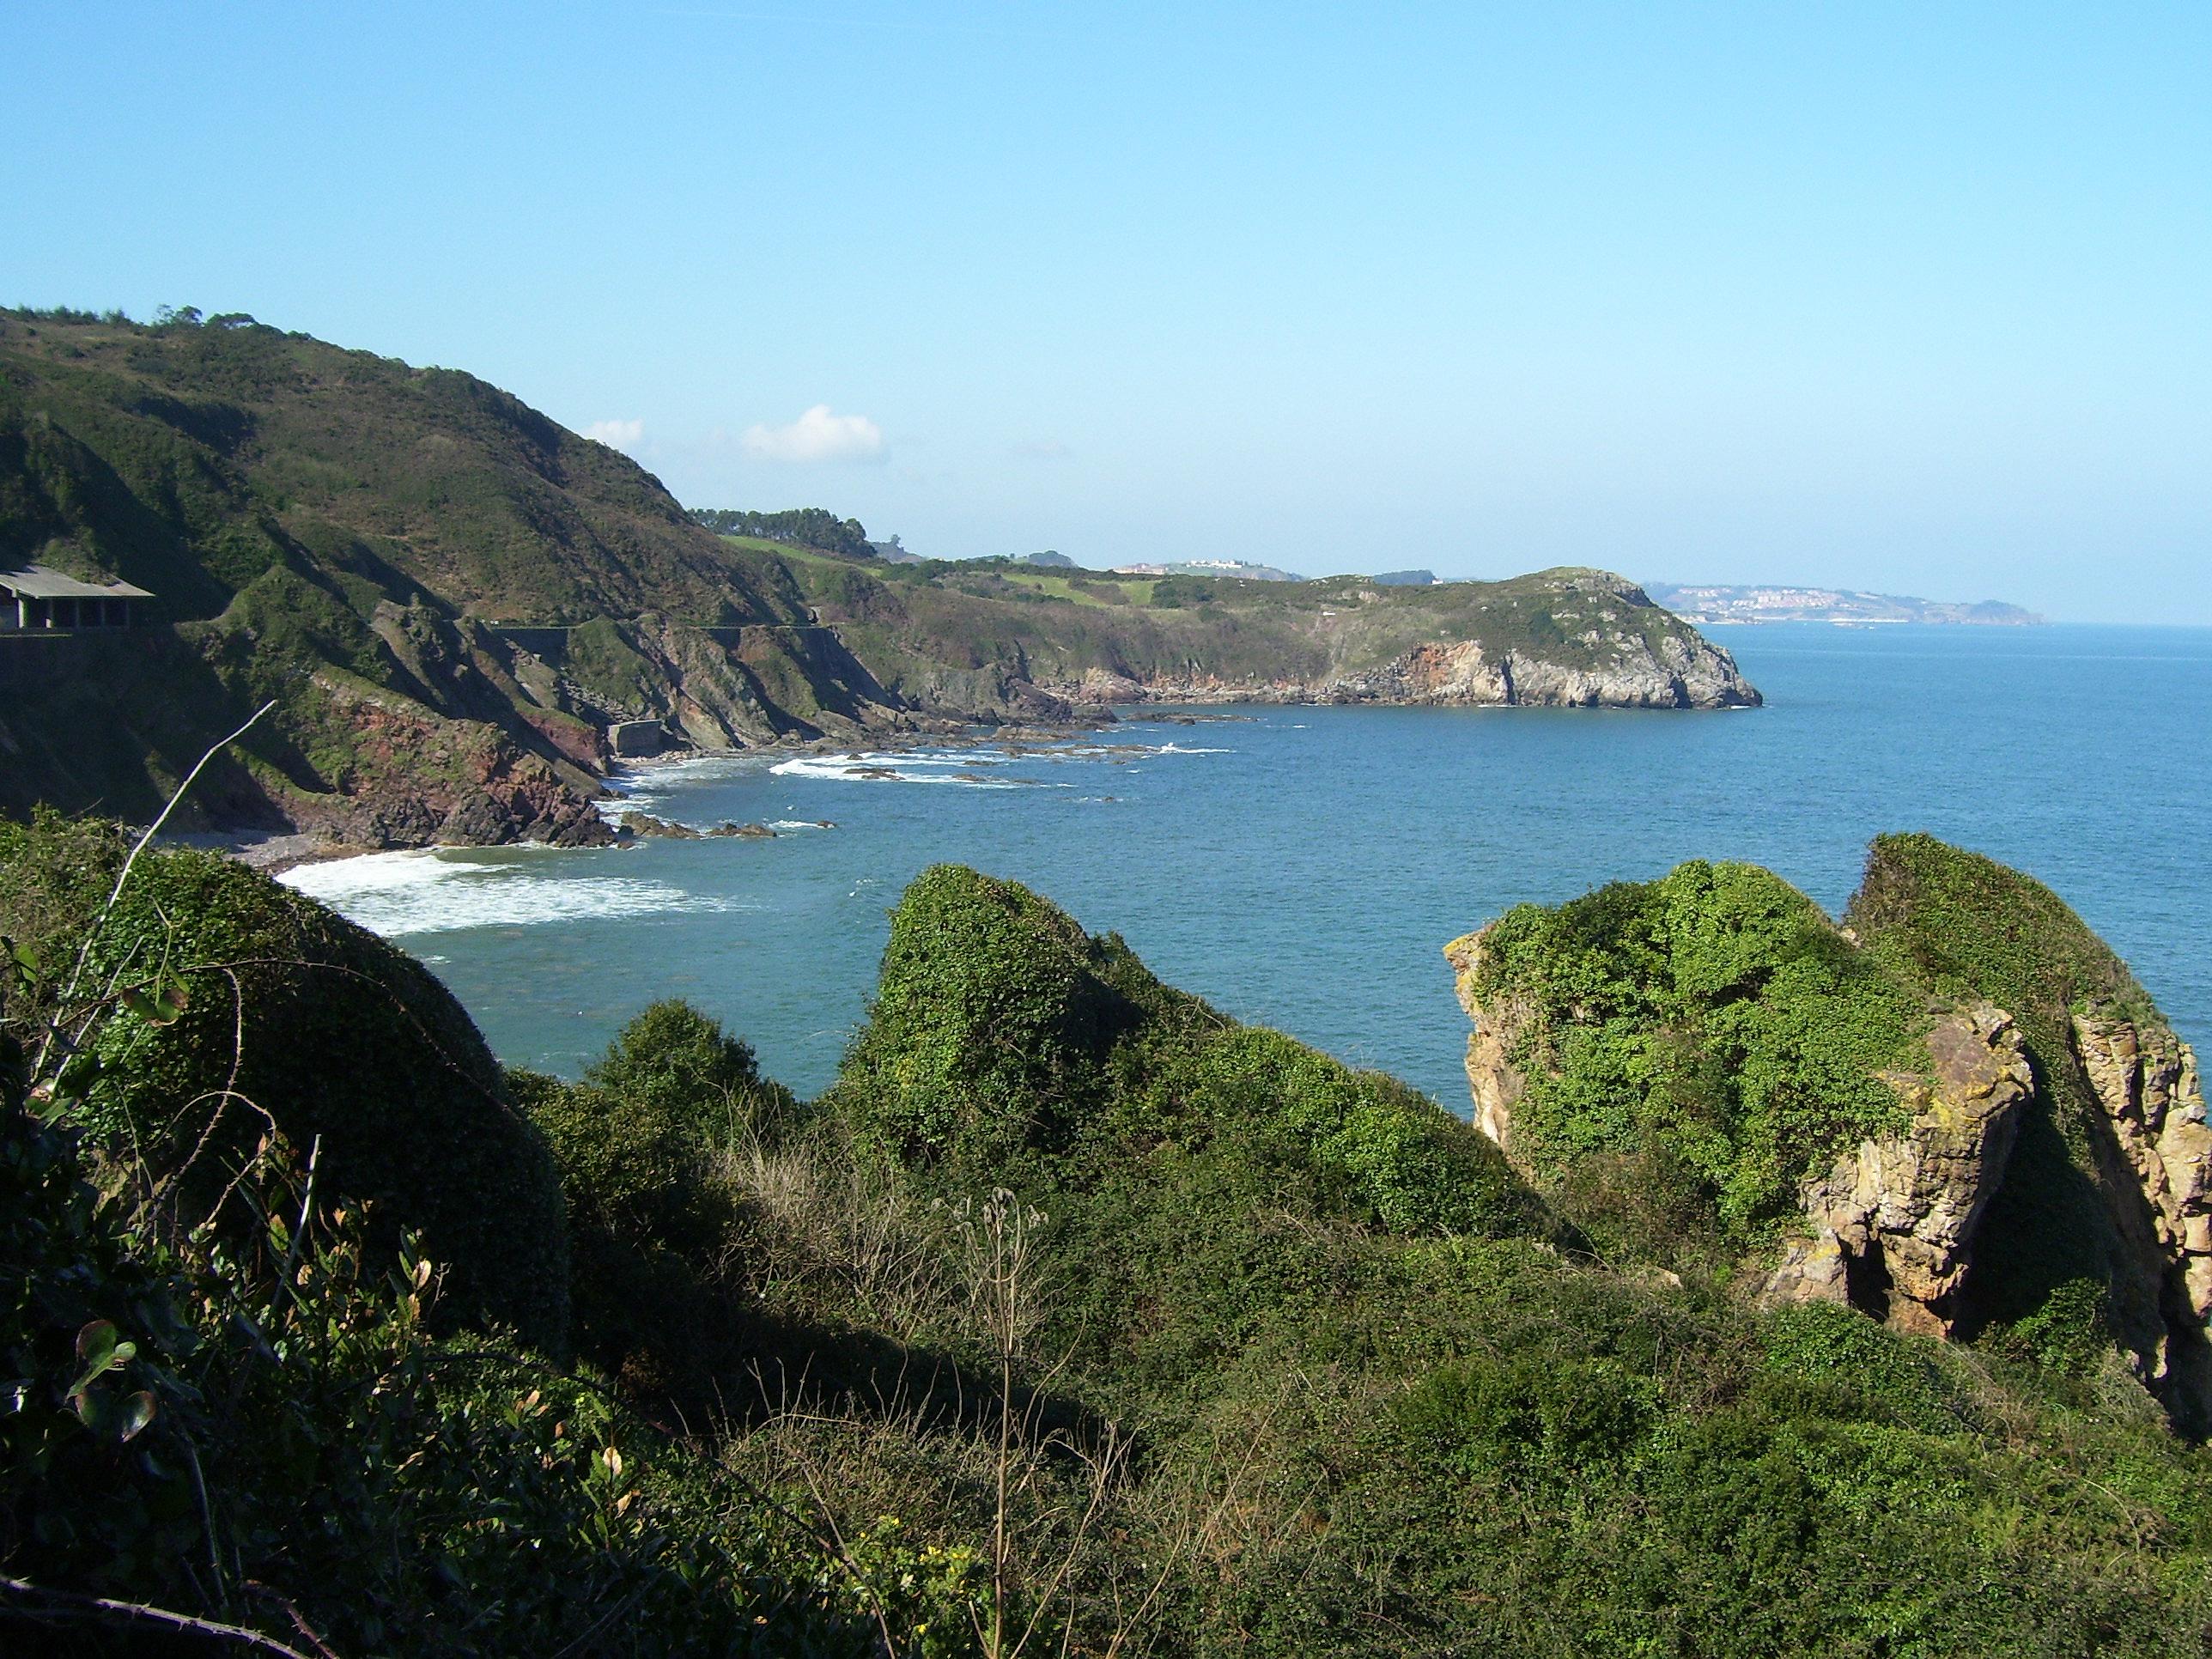 Playa Perchel